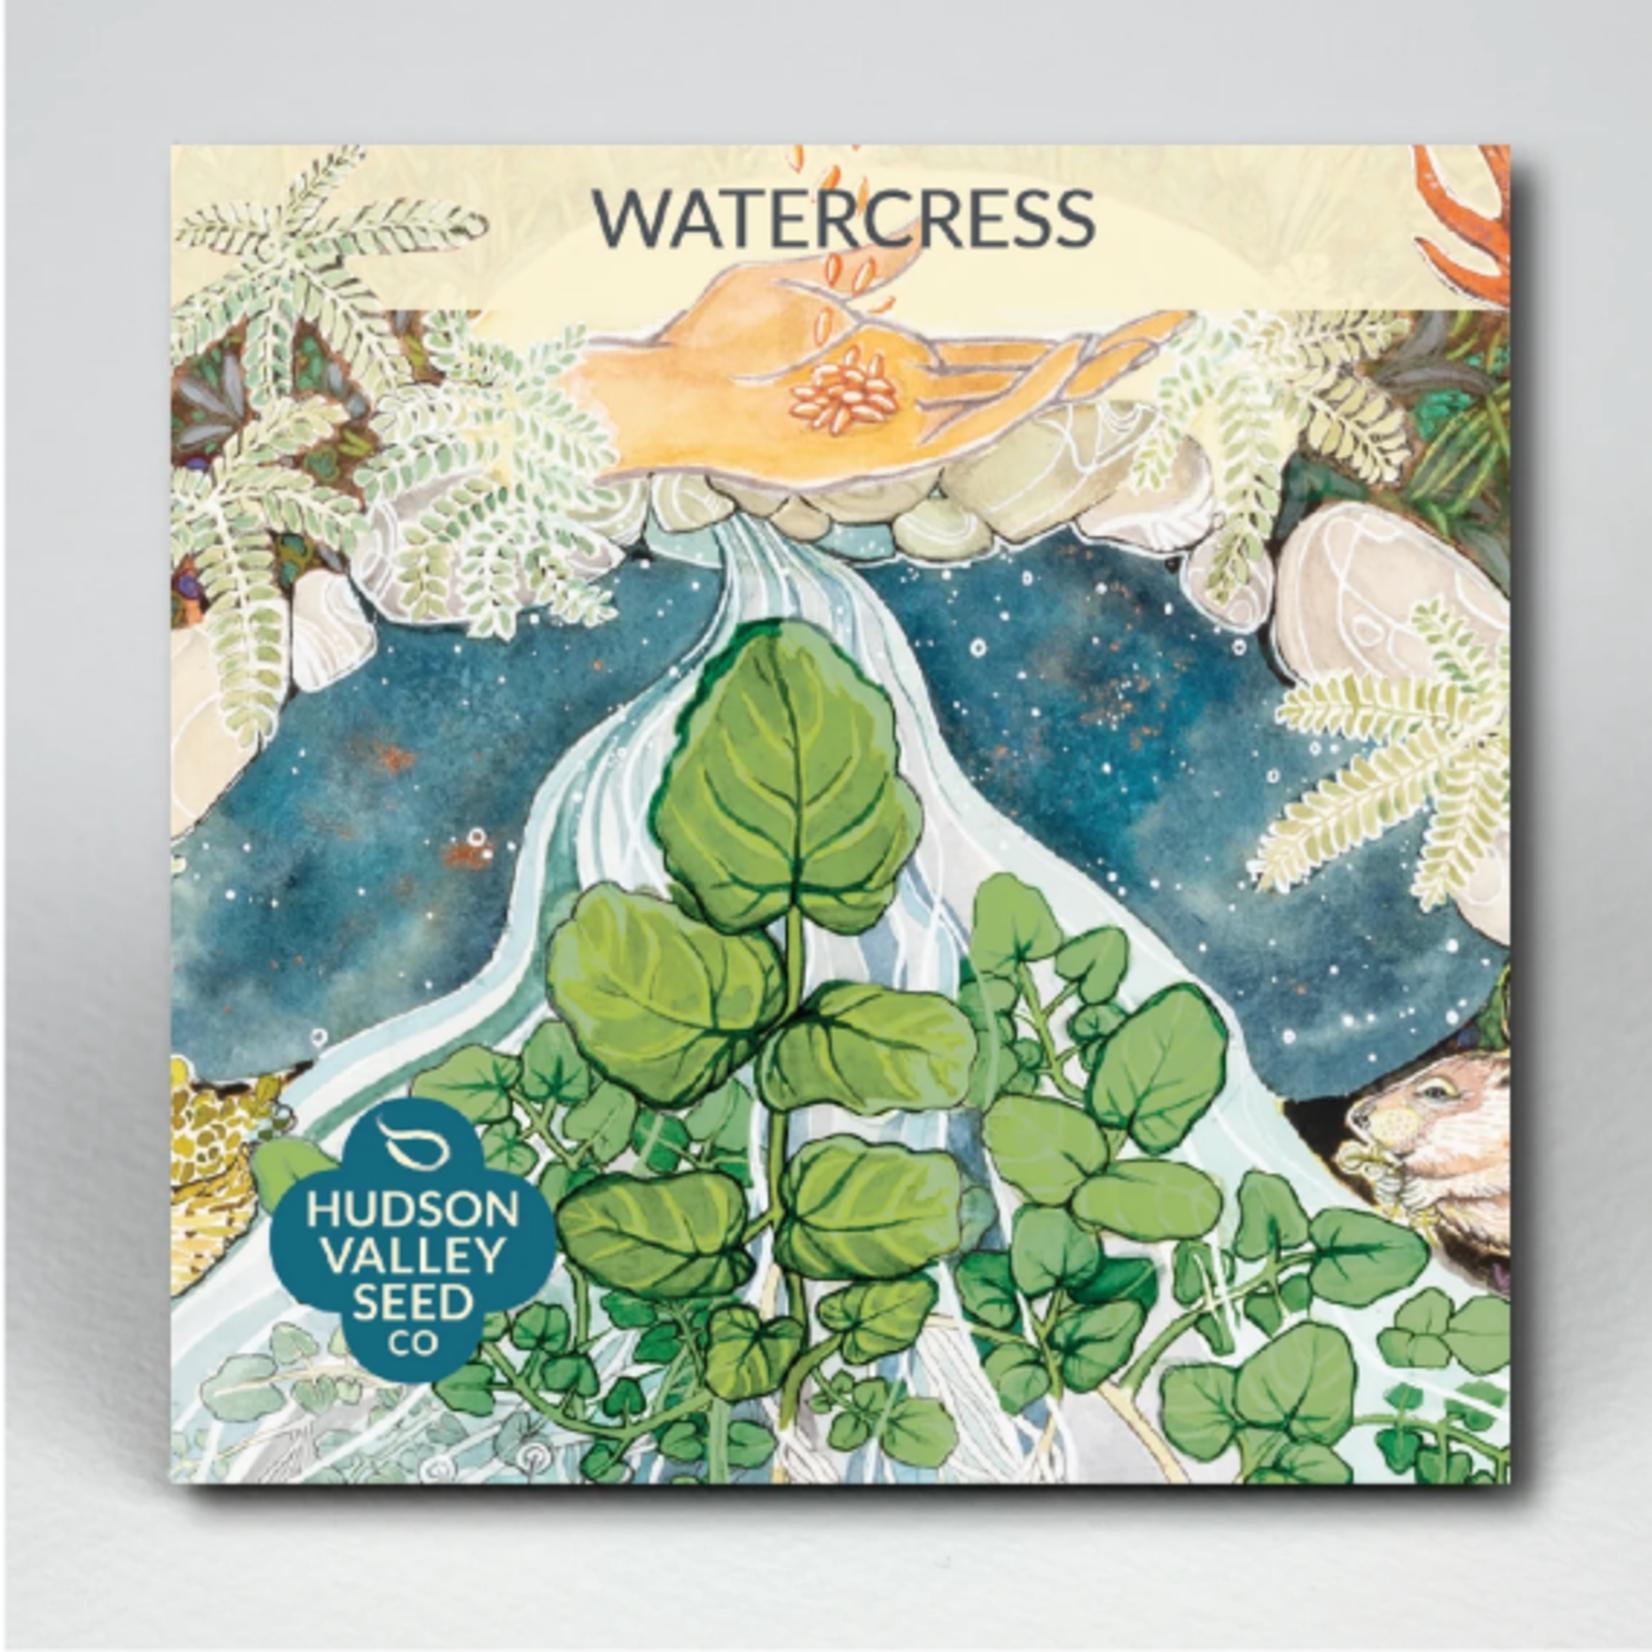 Hudson Valley Seeds Watercress Seeds